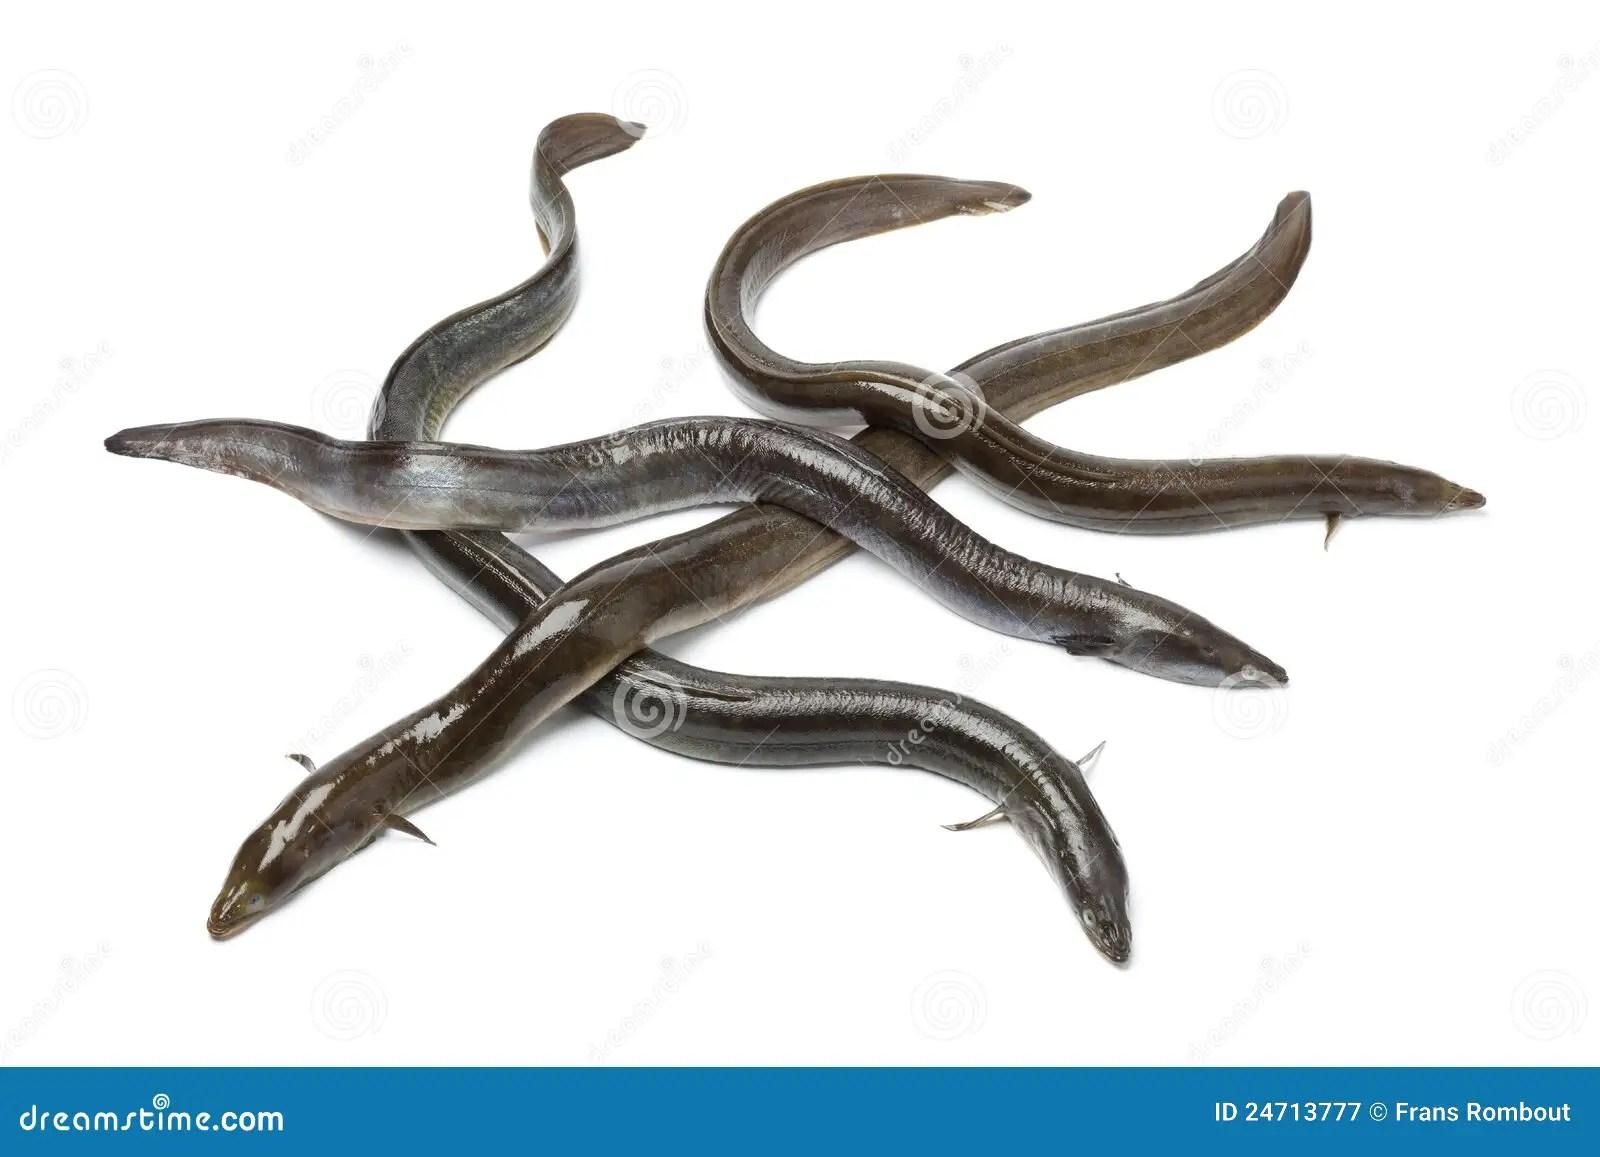 hight resolution of fresh european eel